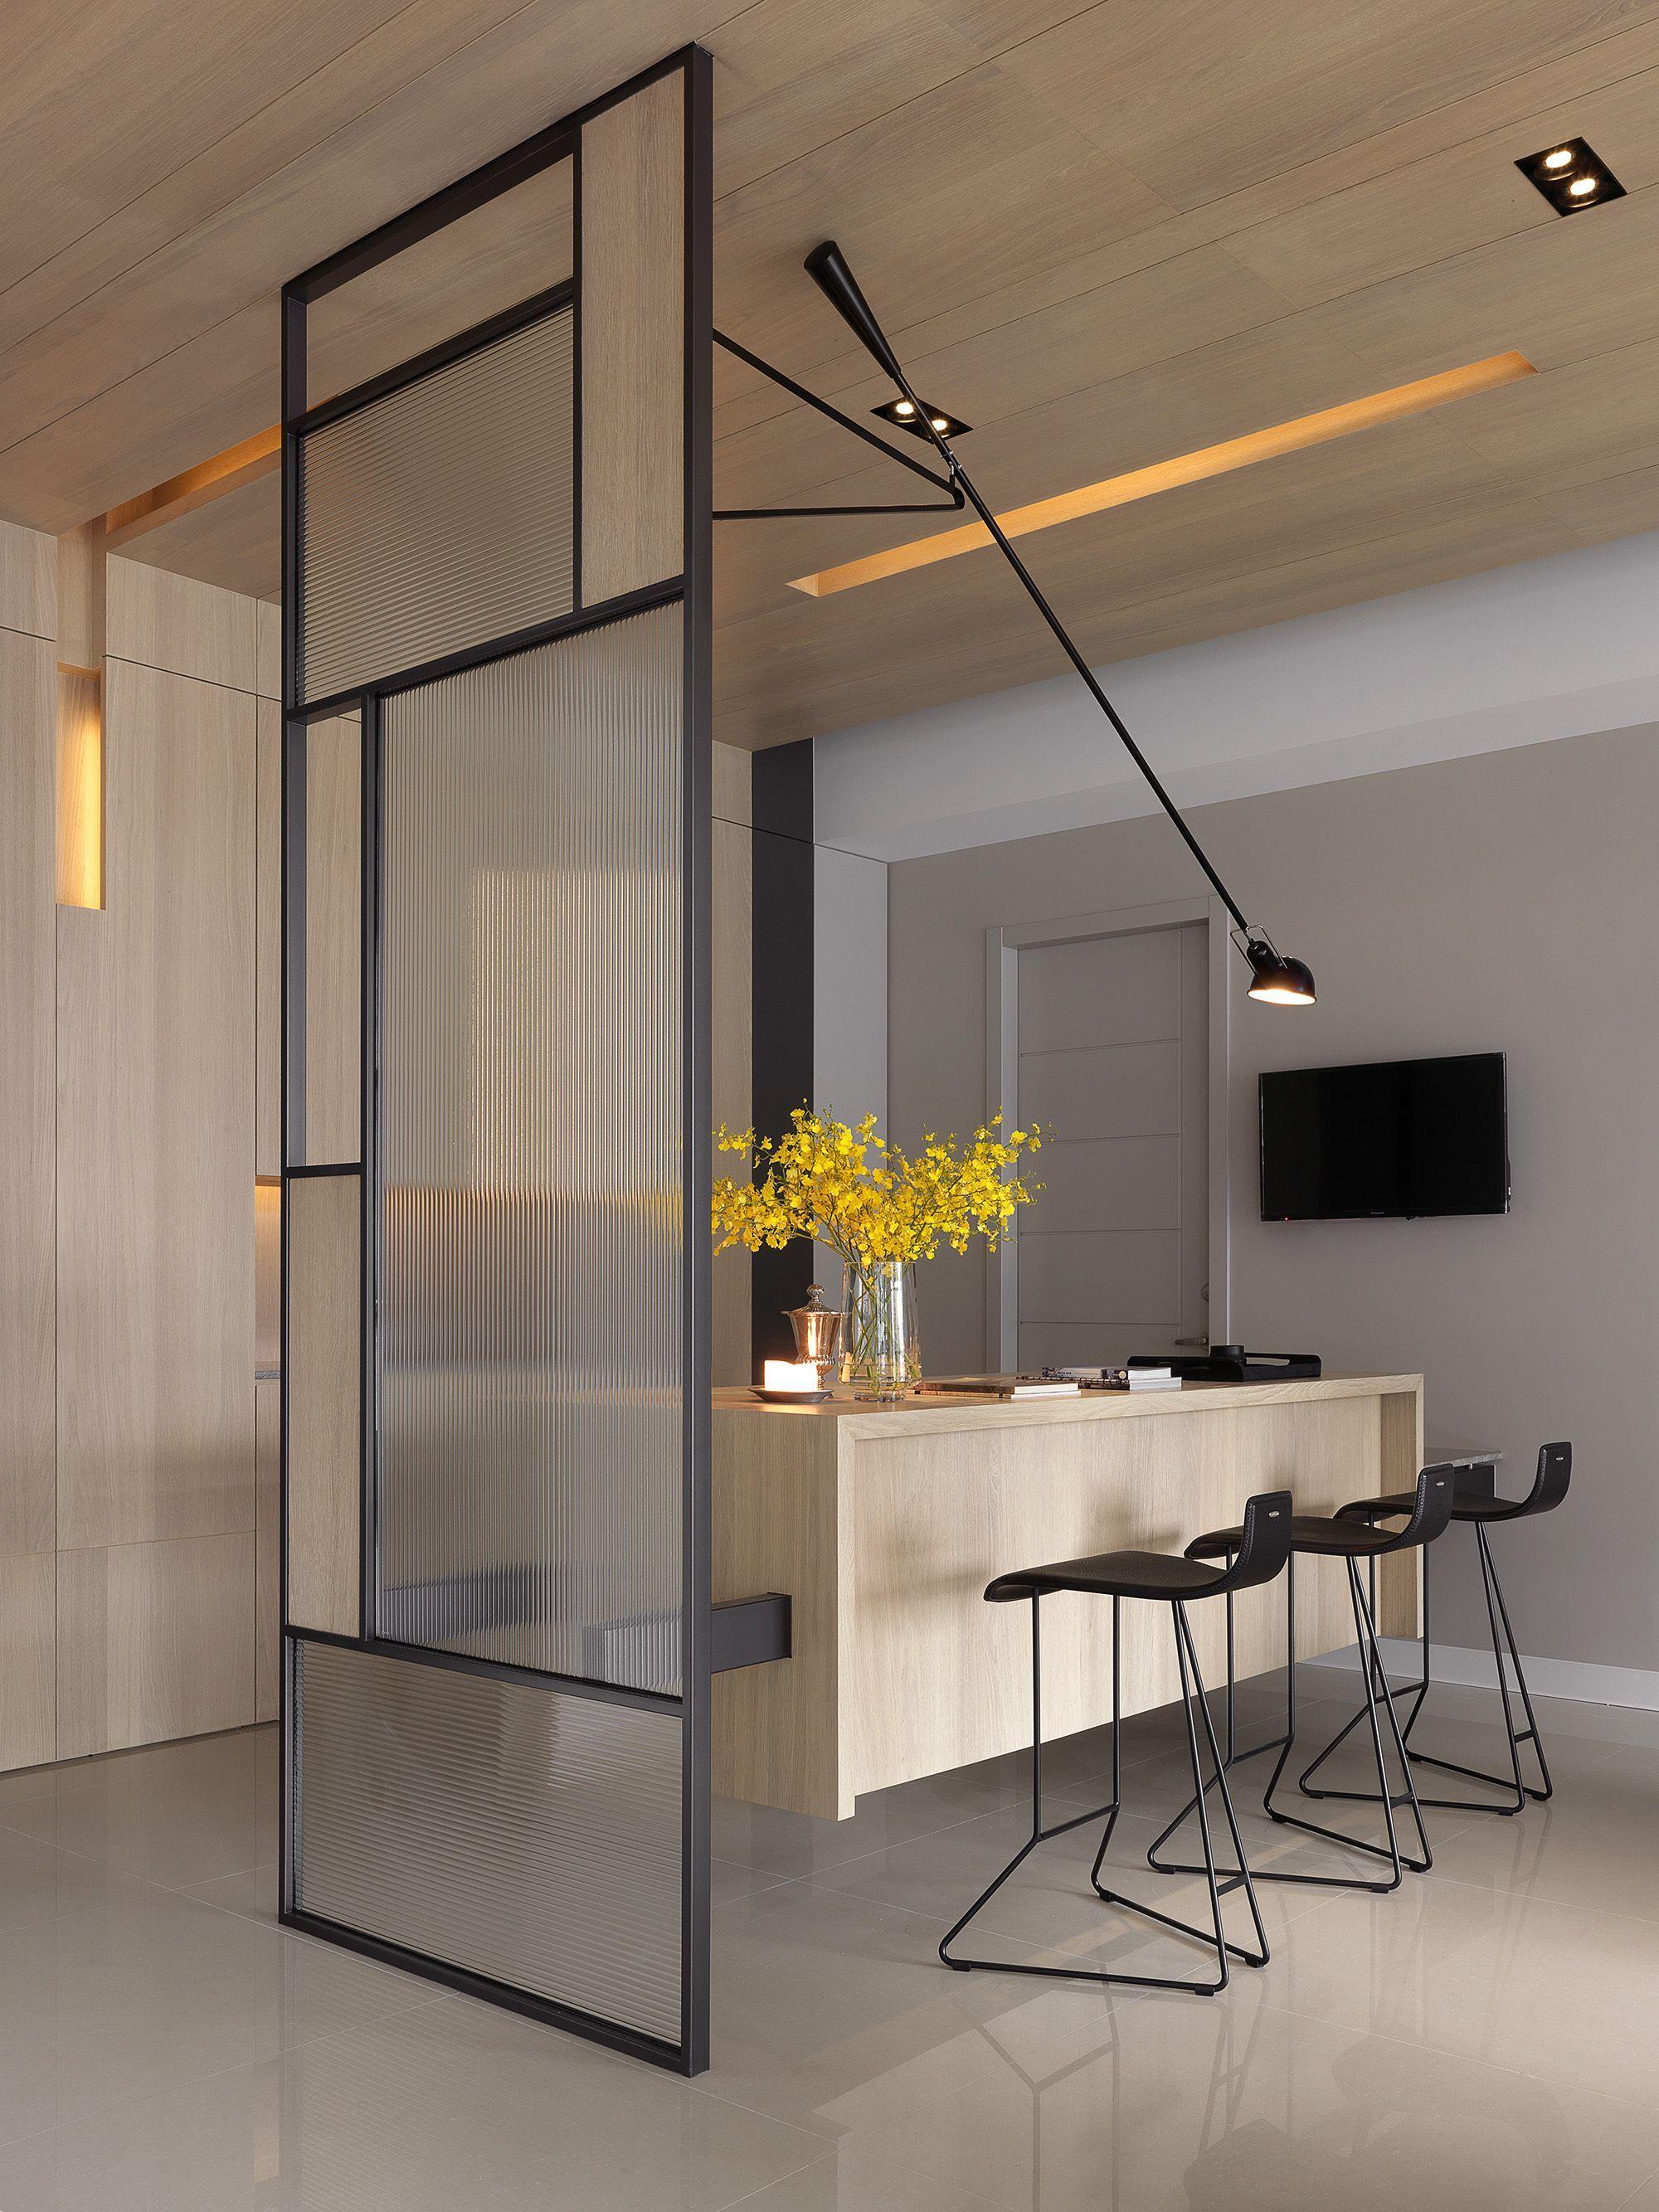 creative interior doors decoration ideas personalizing home interiors interiordoors doorsideas also modern design studio moderninteriordesign rh pinterest